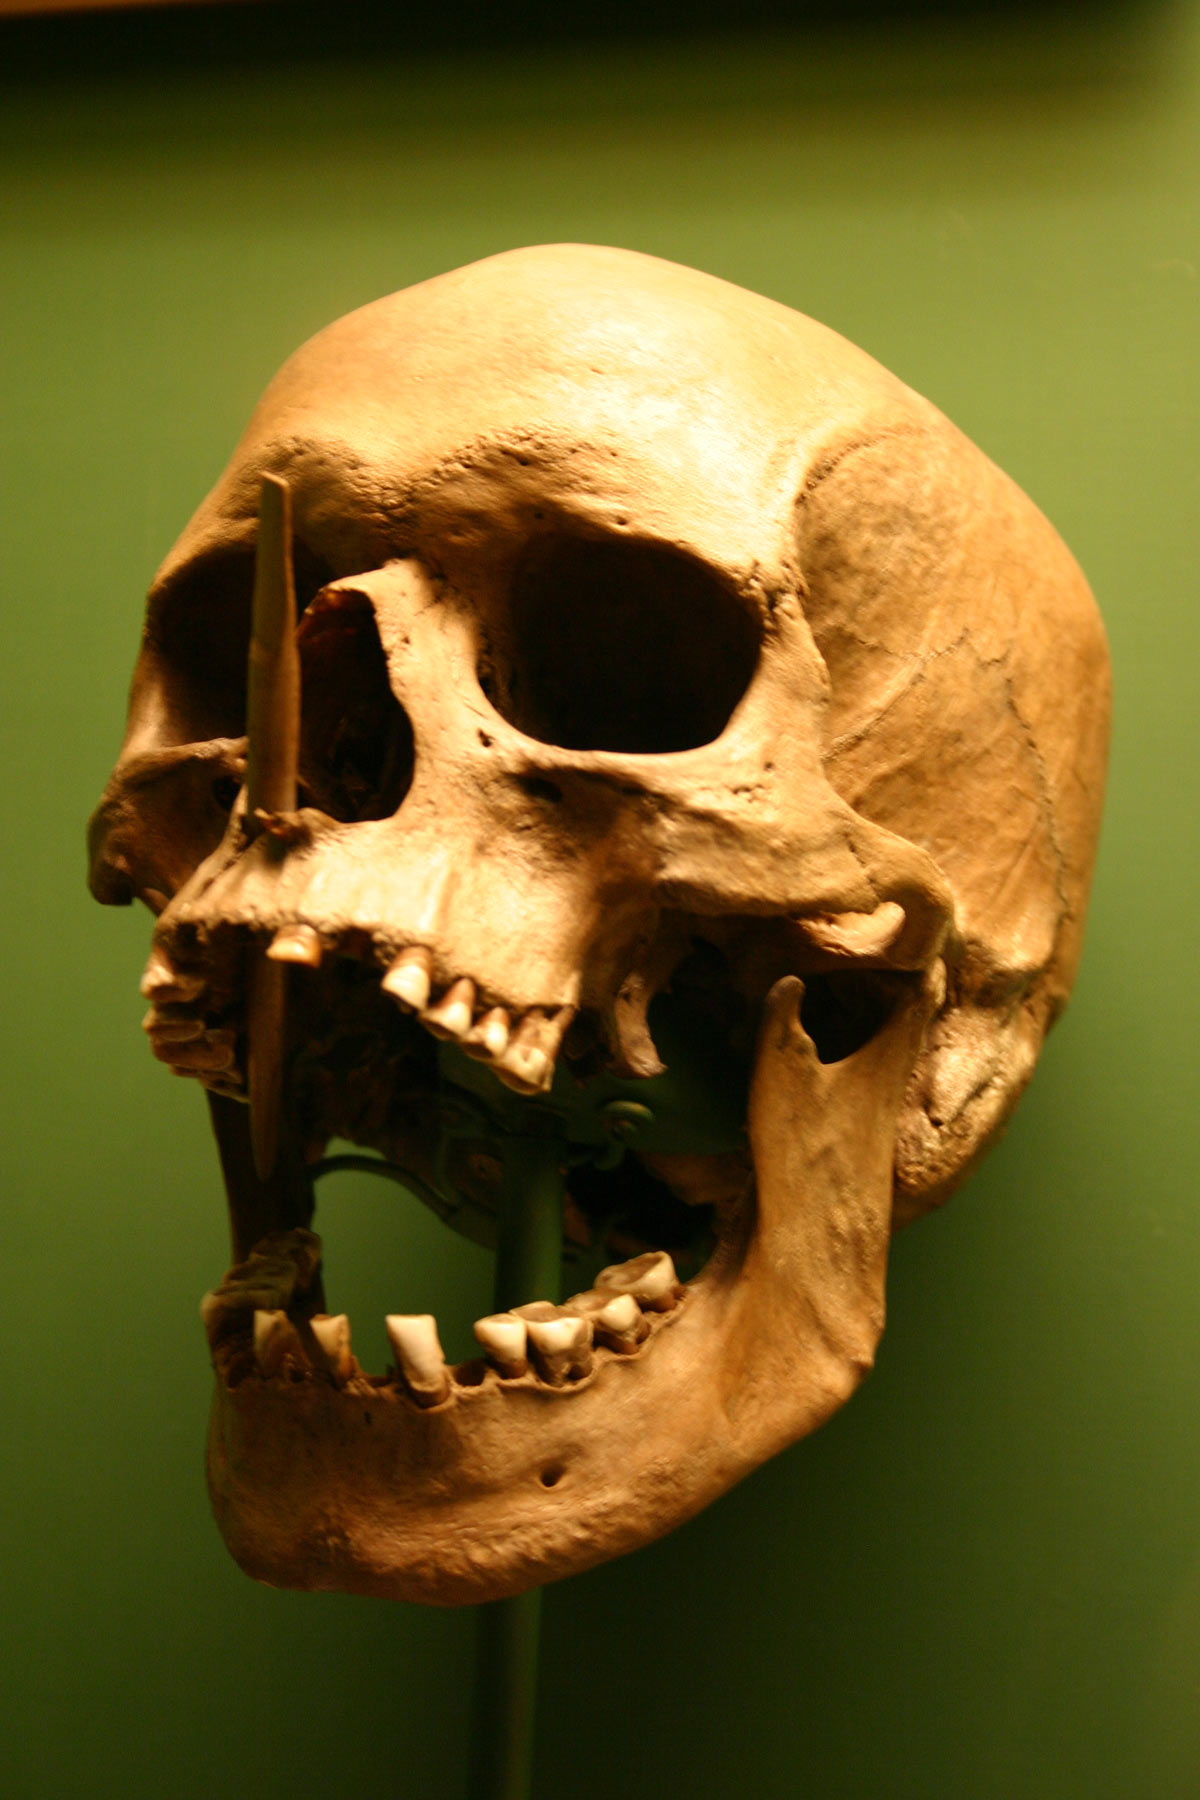 Skull, Old, Human, Cranium, Bone, HQ Photo